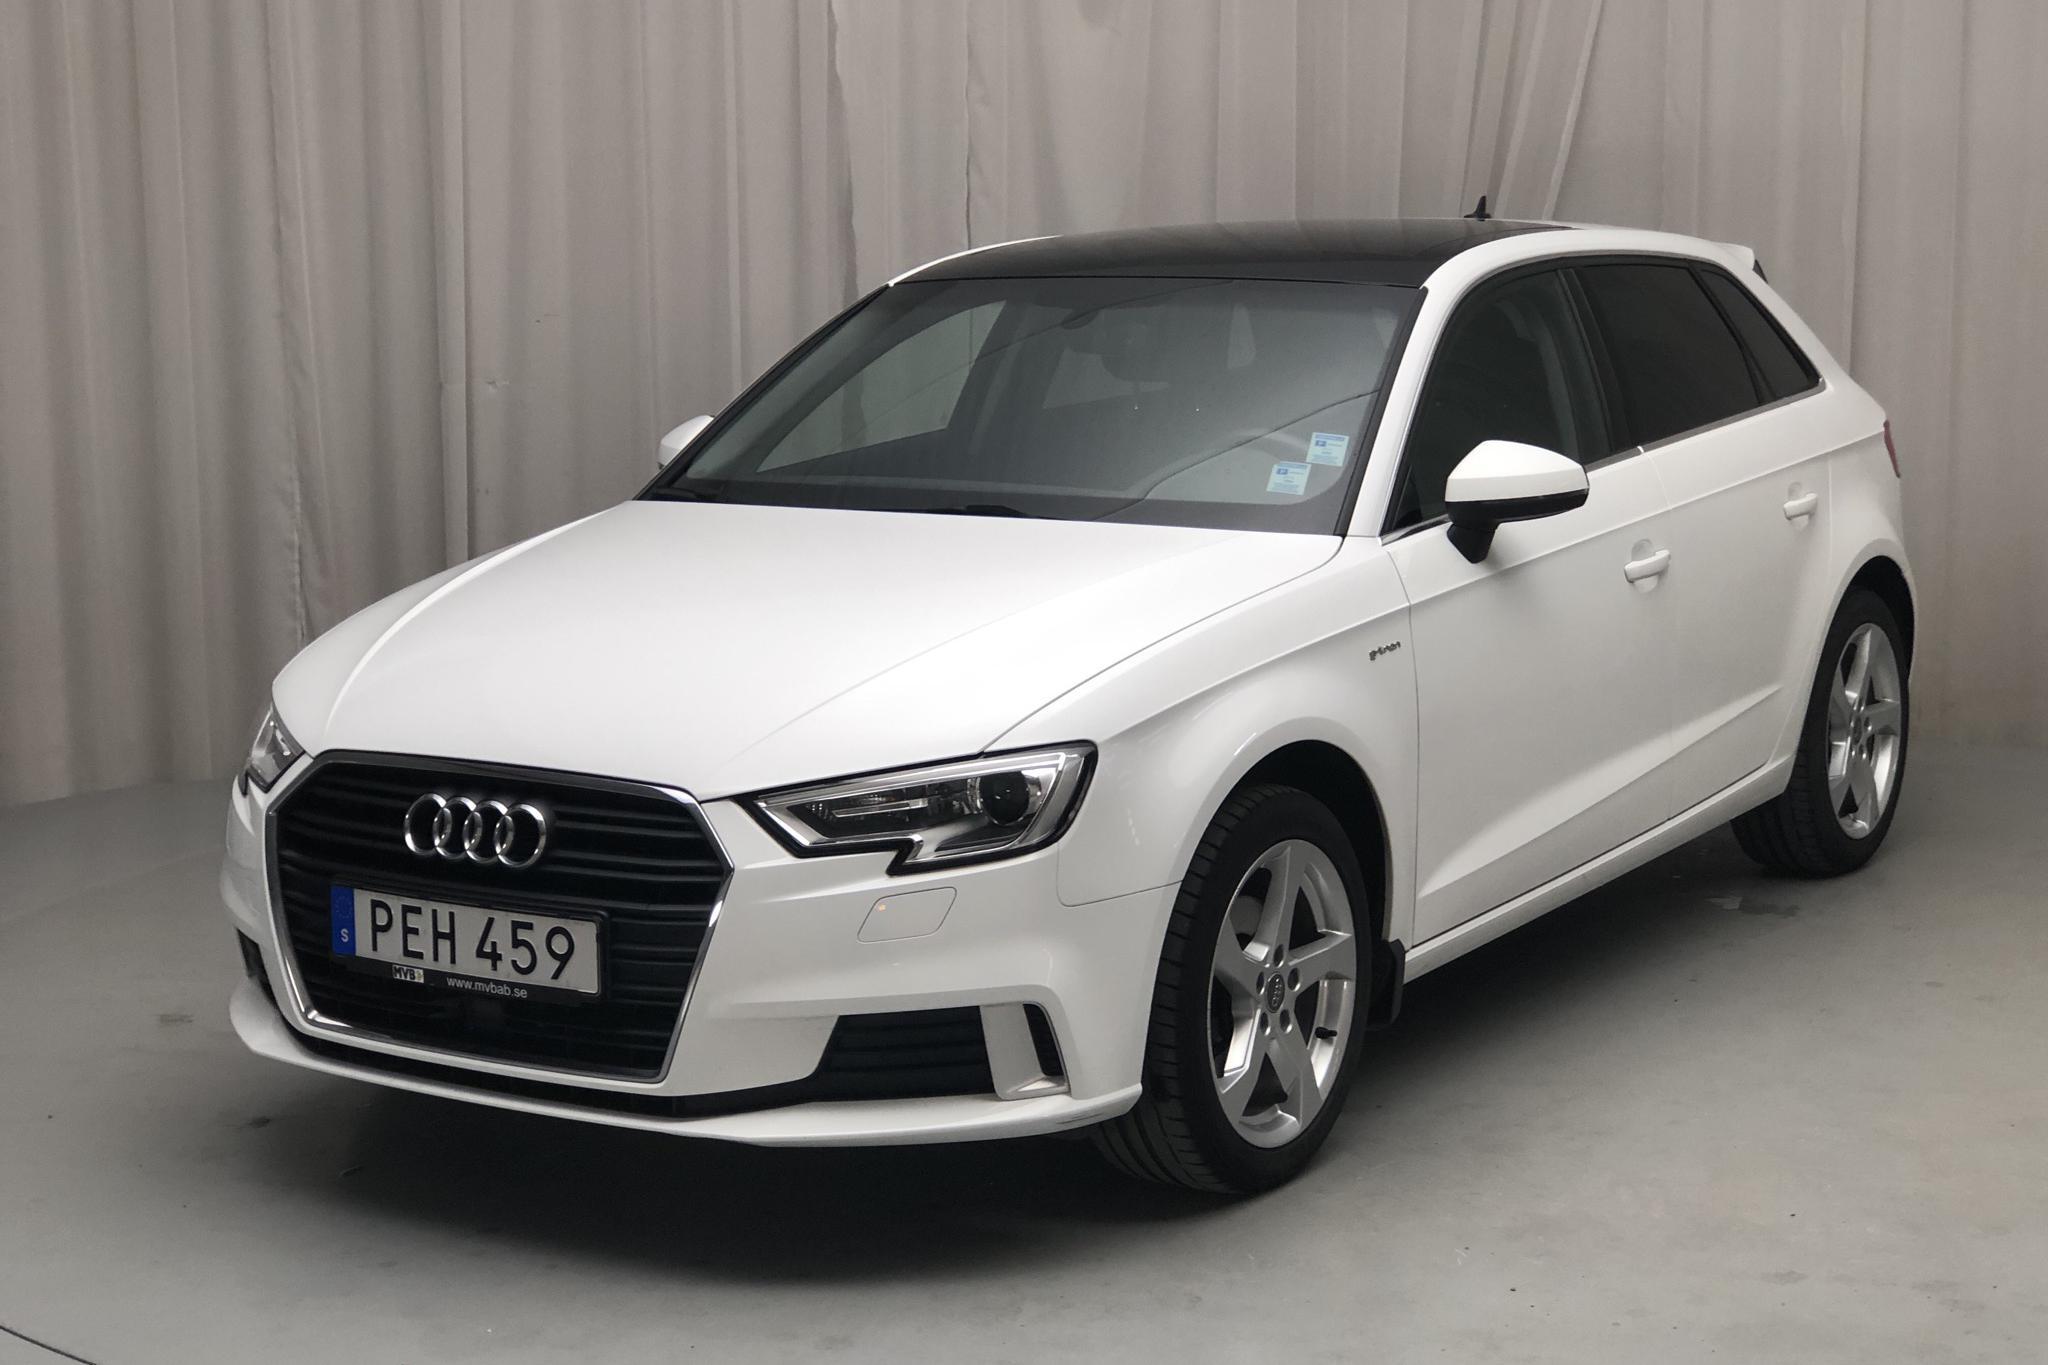 Audi A3 1.4 TFSI g-tron Sportback (110hk) - 3 423 mil - Manuell - vit - 2018